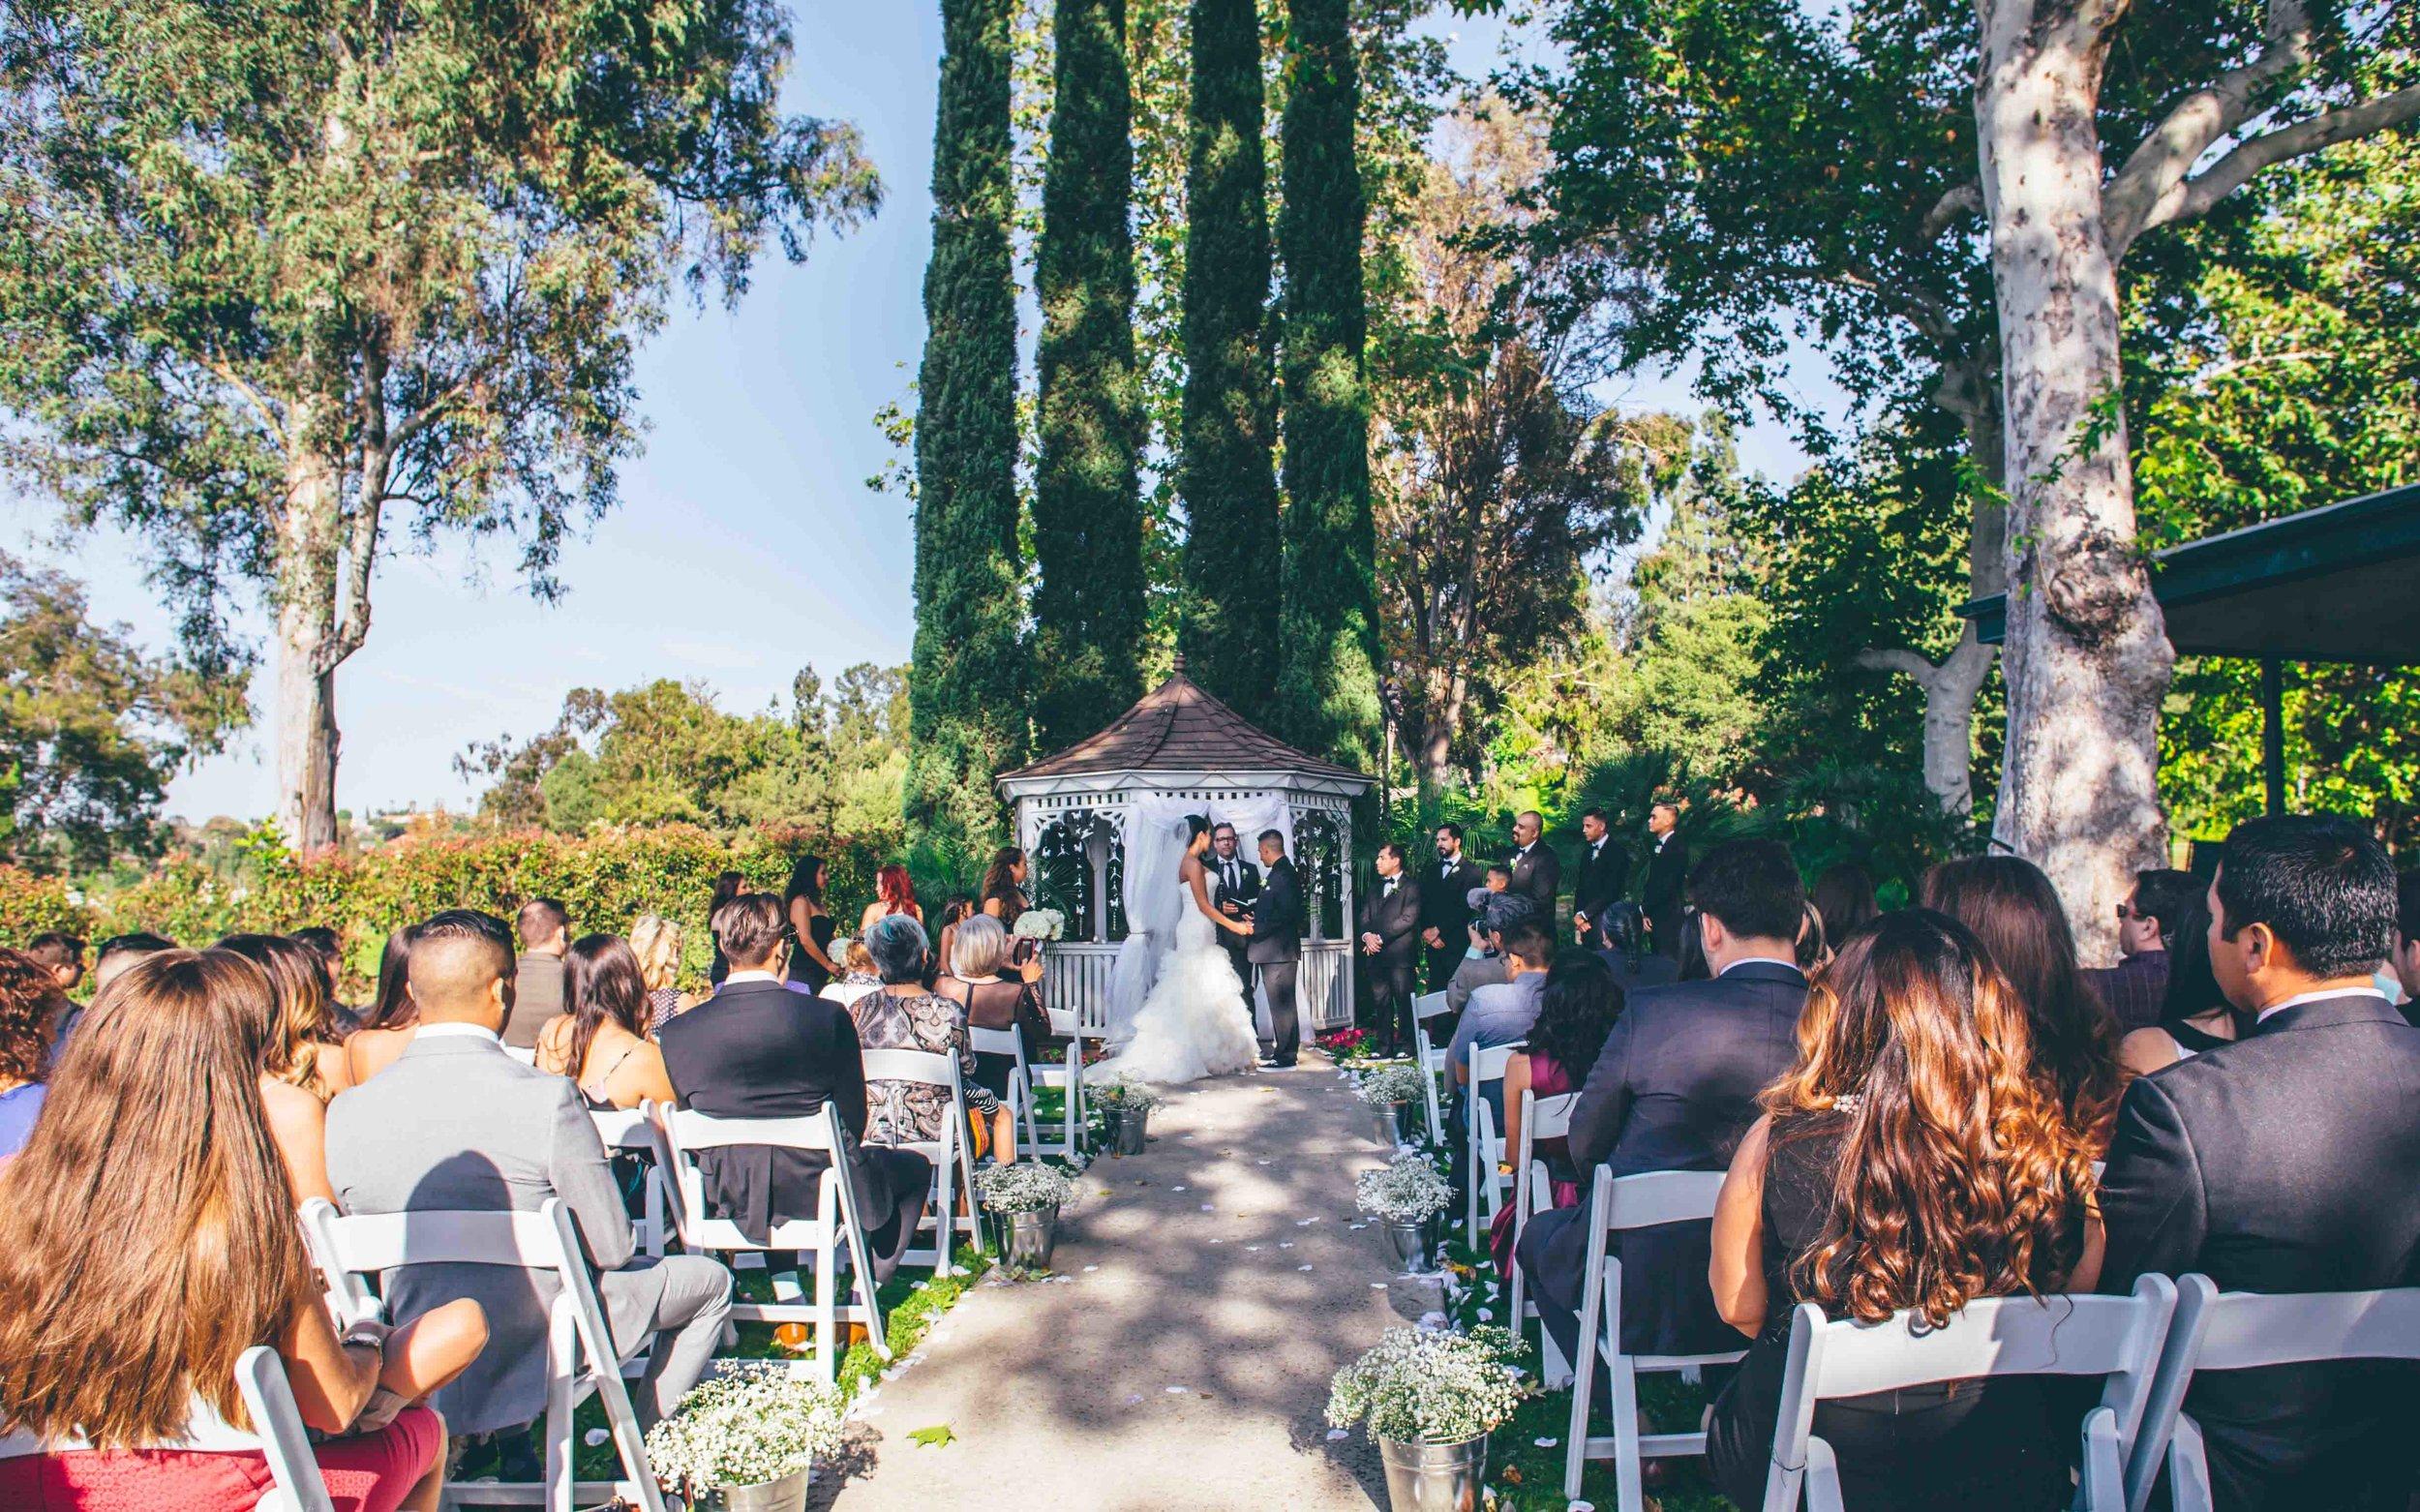 APavone-Photographer-Orange-County-Diamond-Bar-Wedding-056.jpg